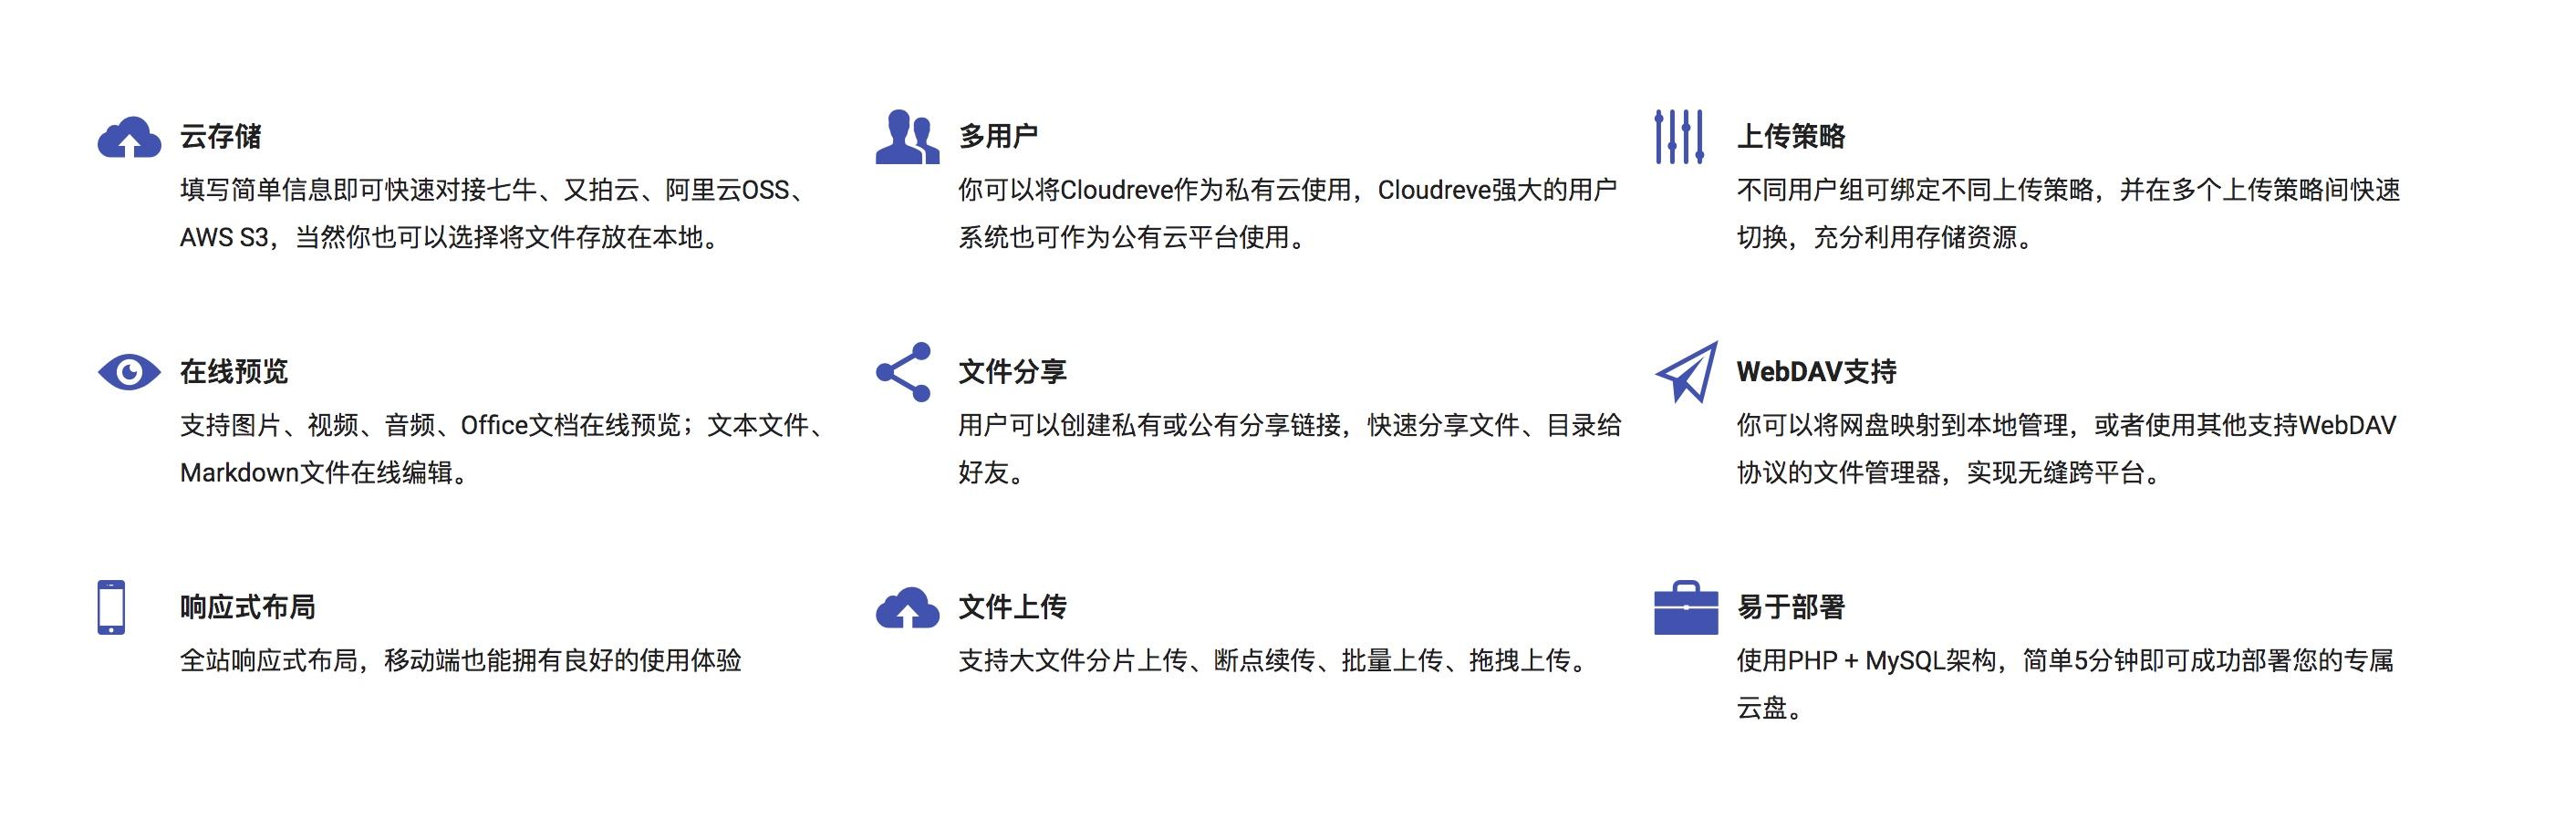 Cloudreve功能